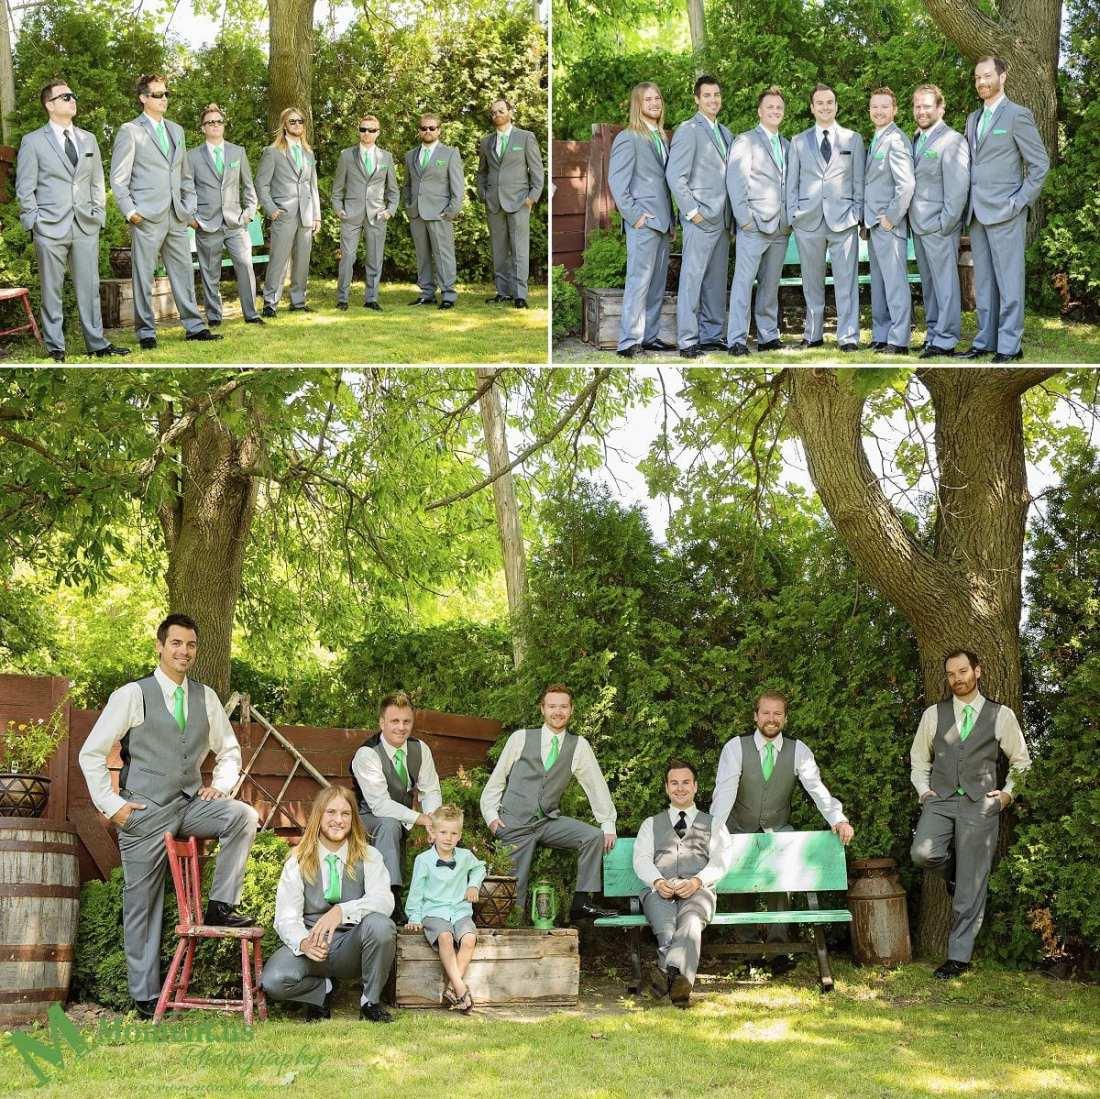 Elegant Cornwall wedding - ushers wearing green ties